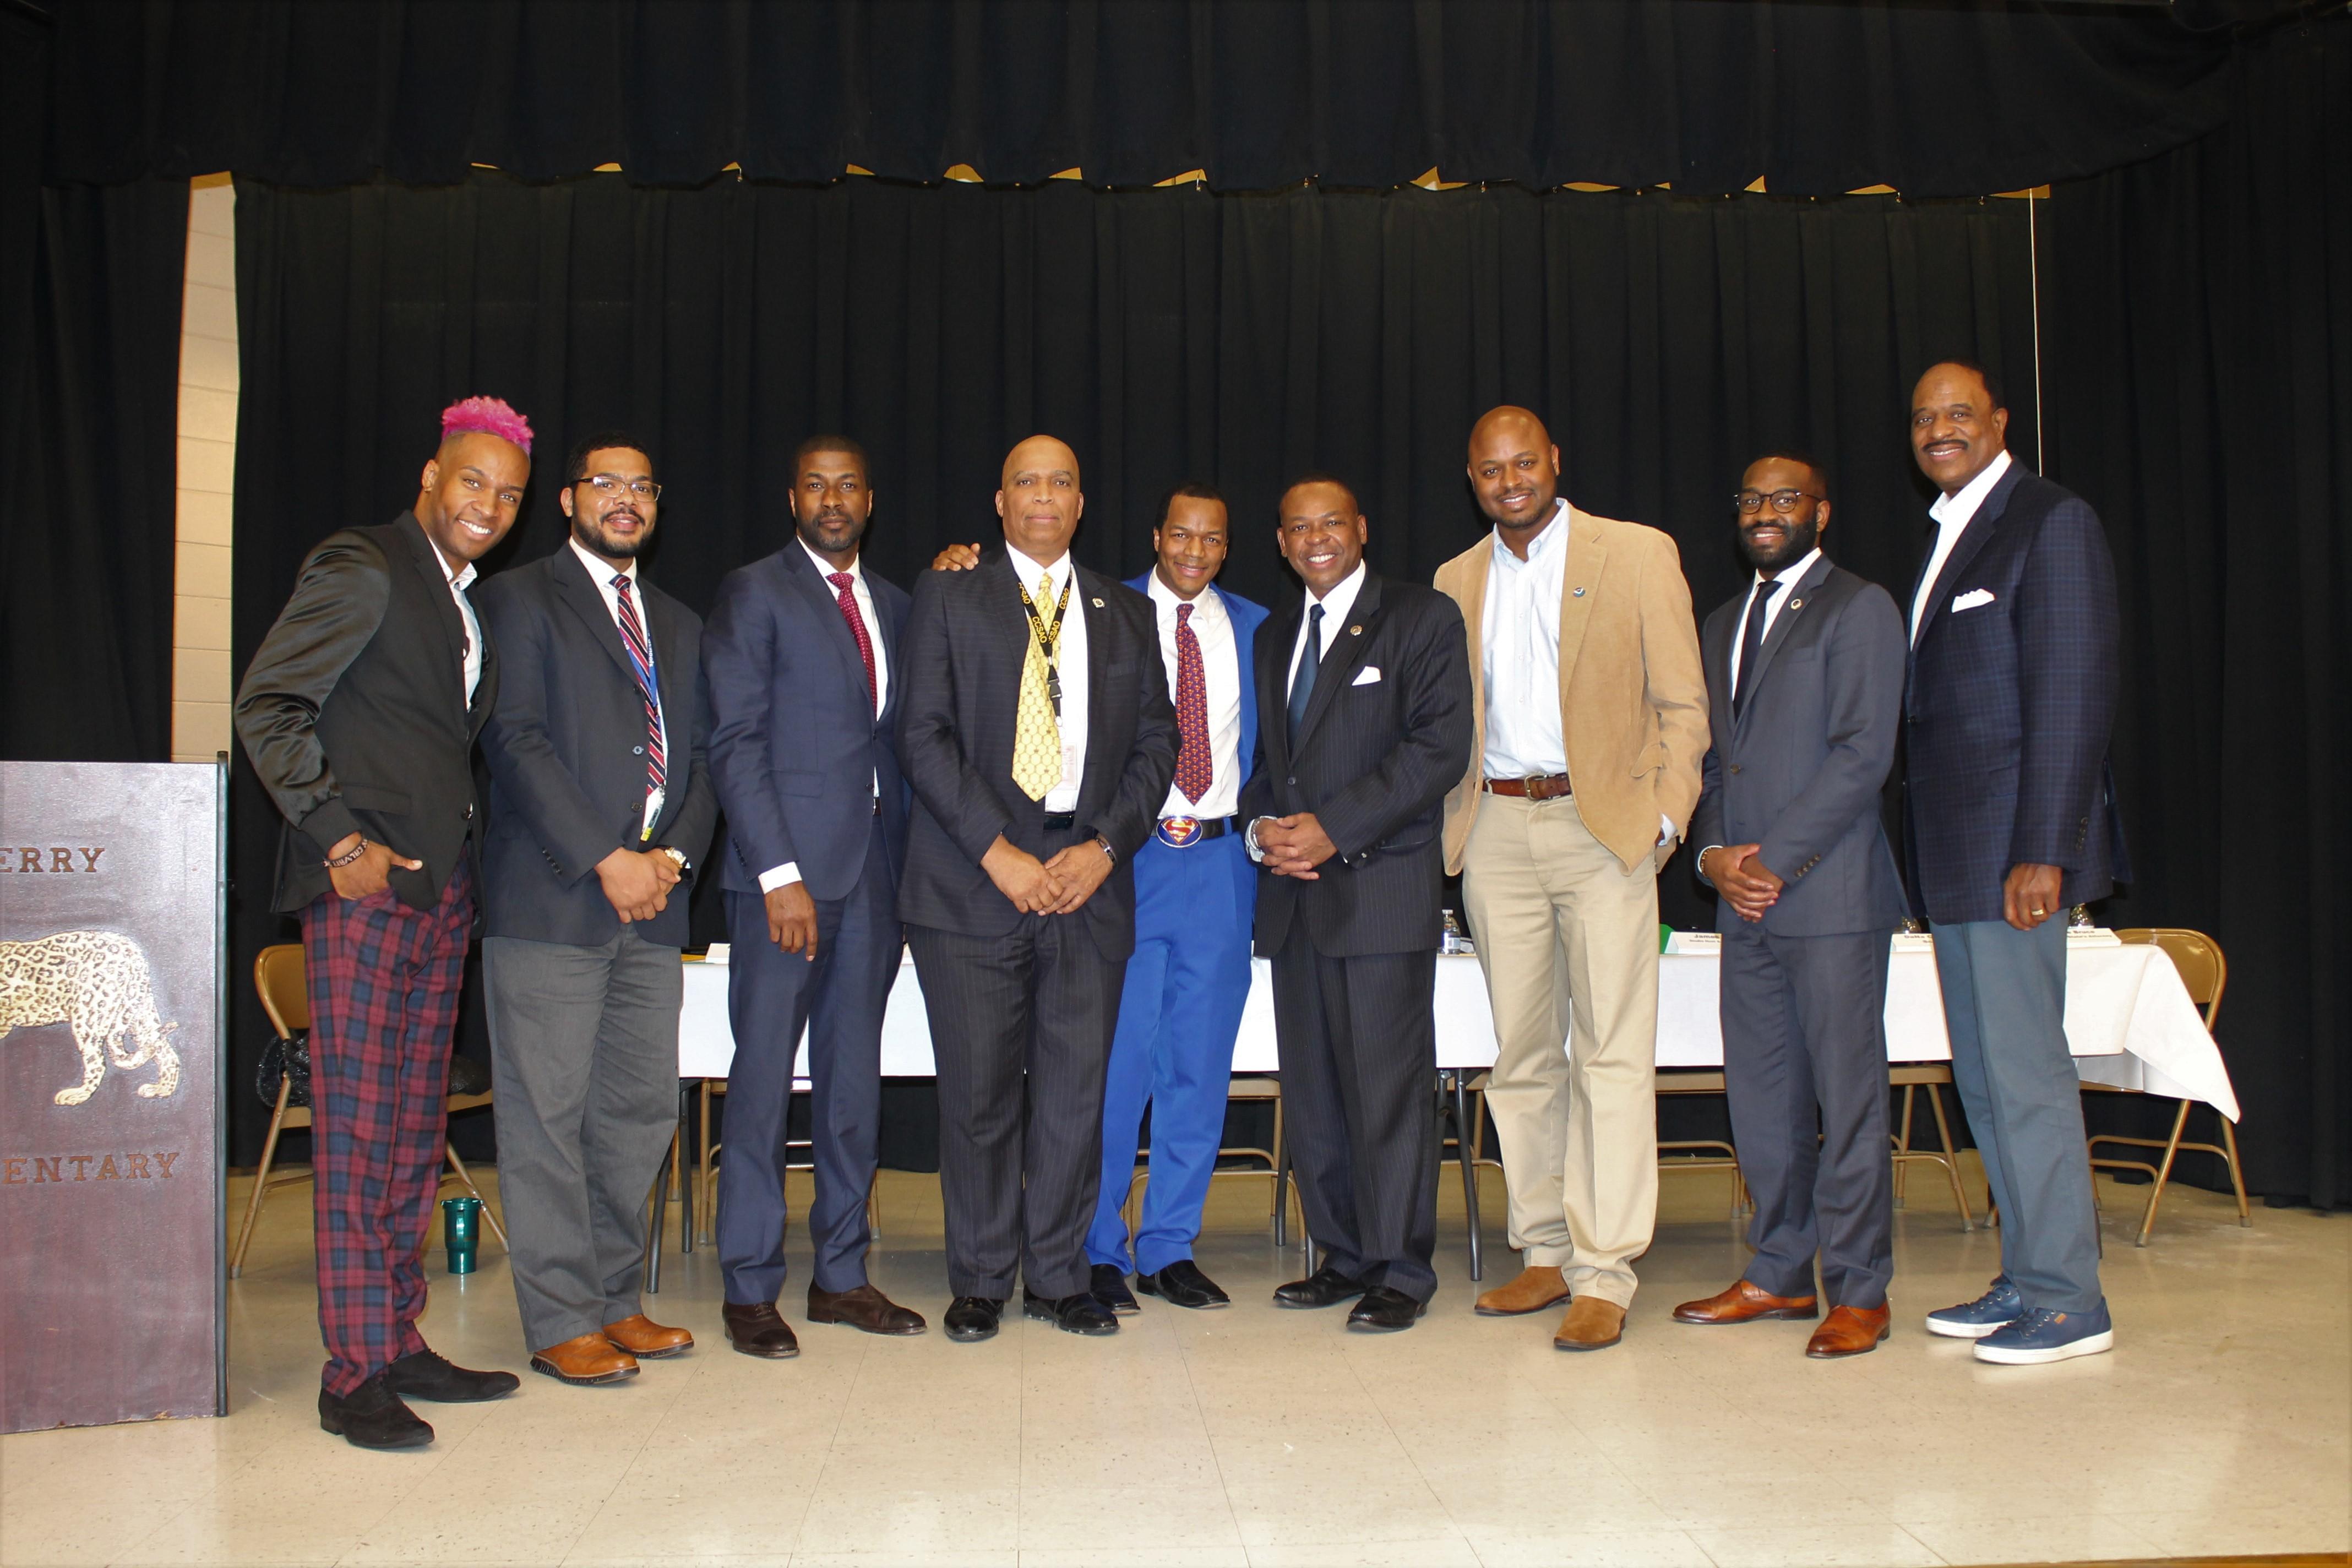 Black History Panel At Berry Elementary School